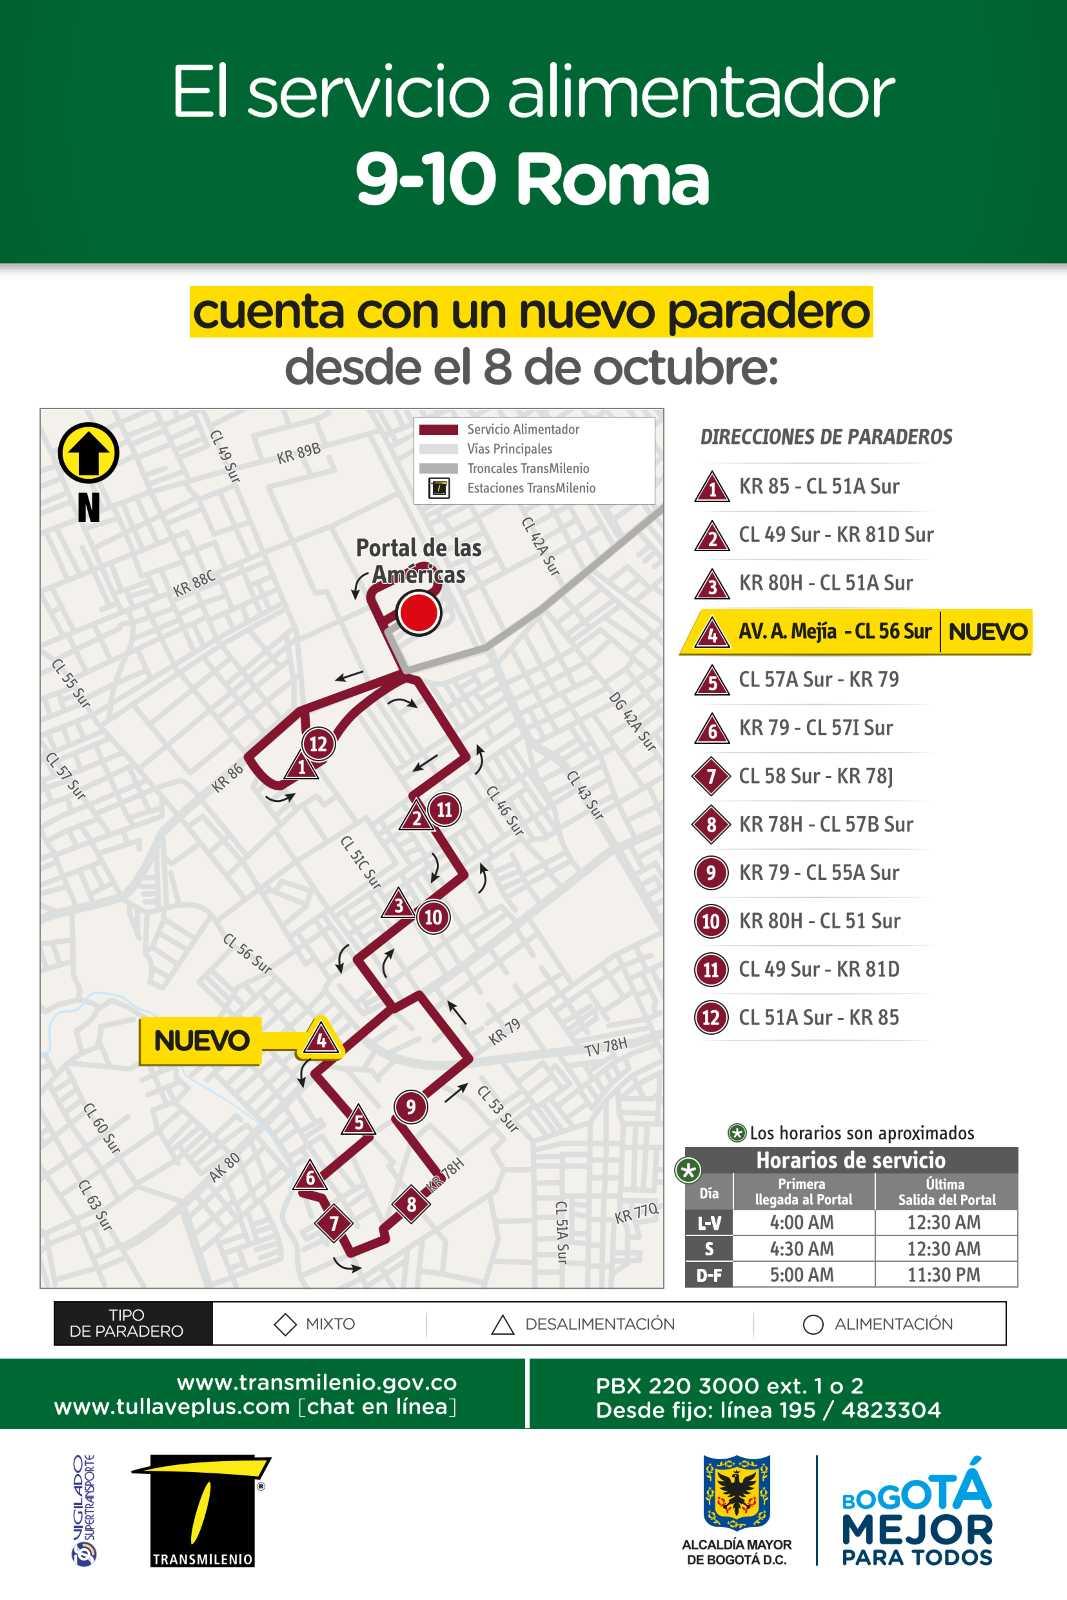 Mapa bus alimentador 9-10 Roma